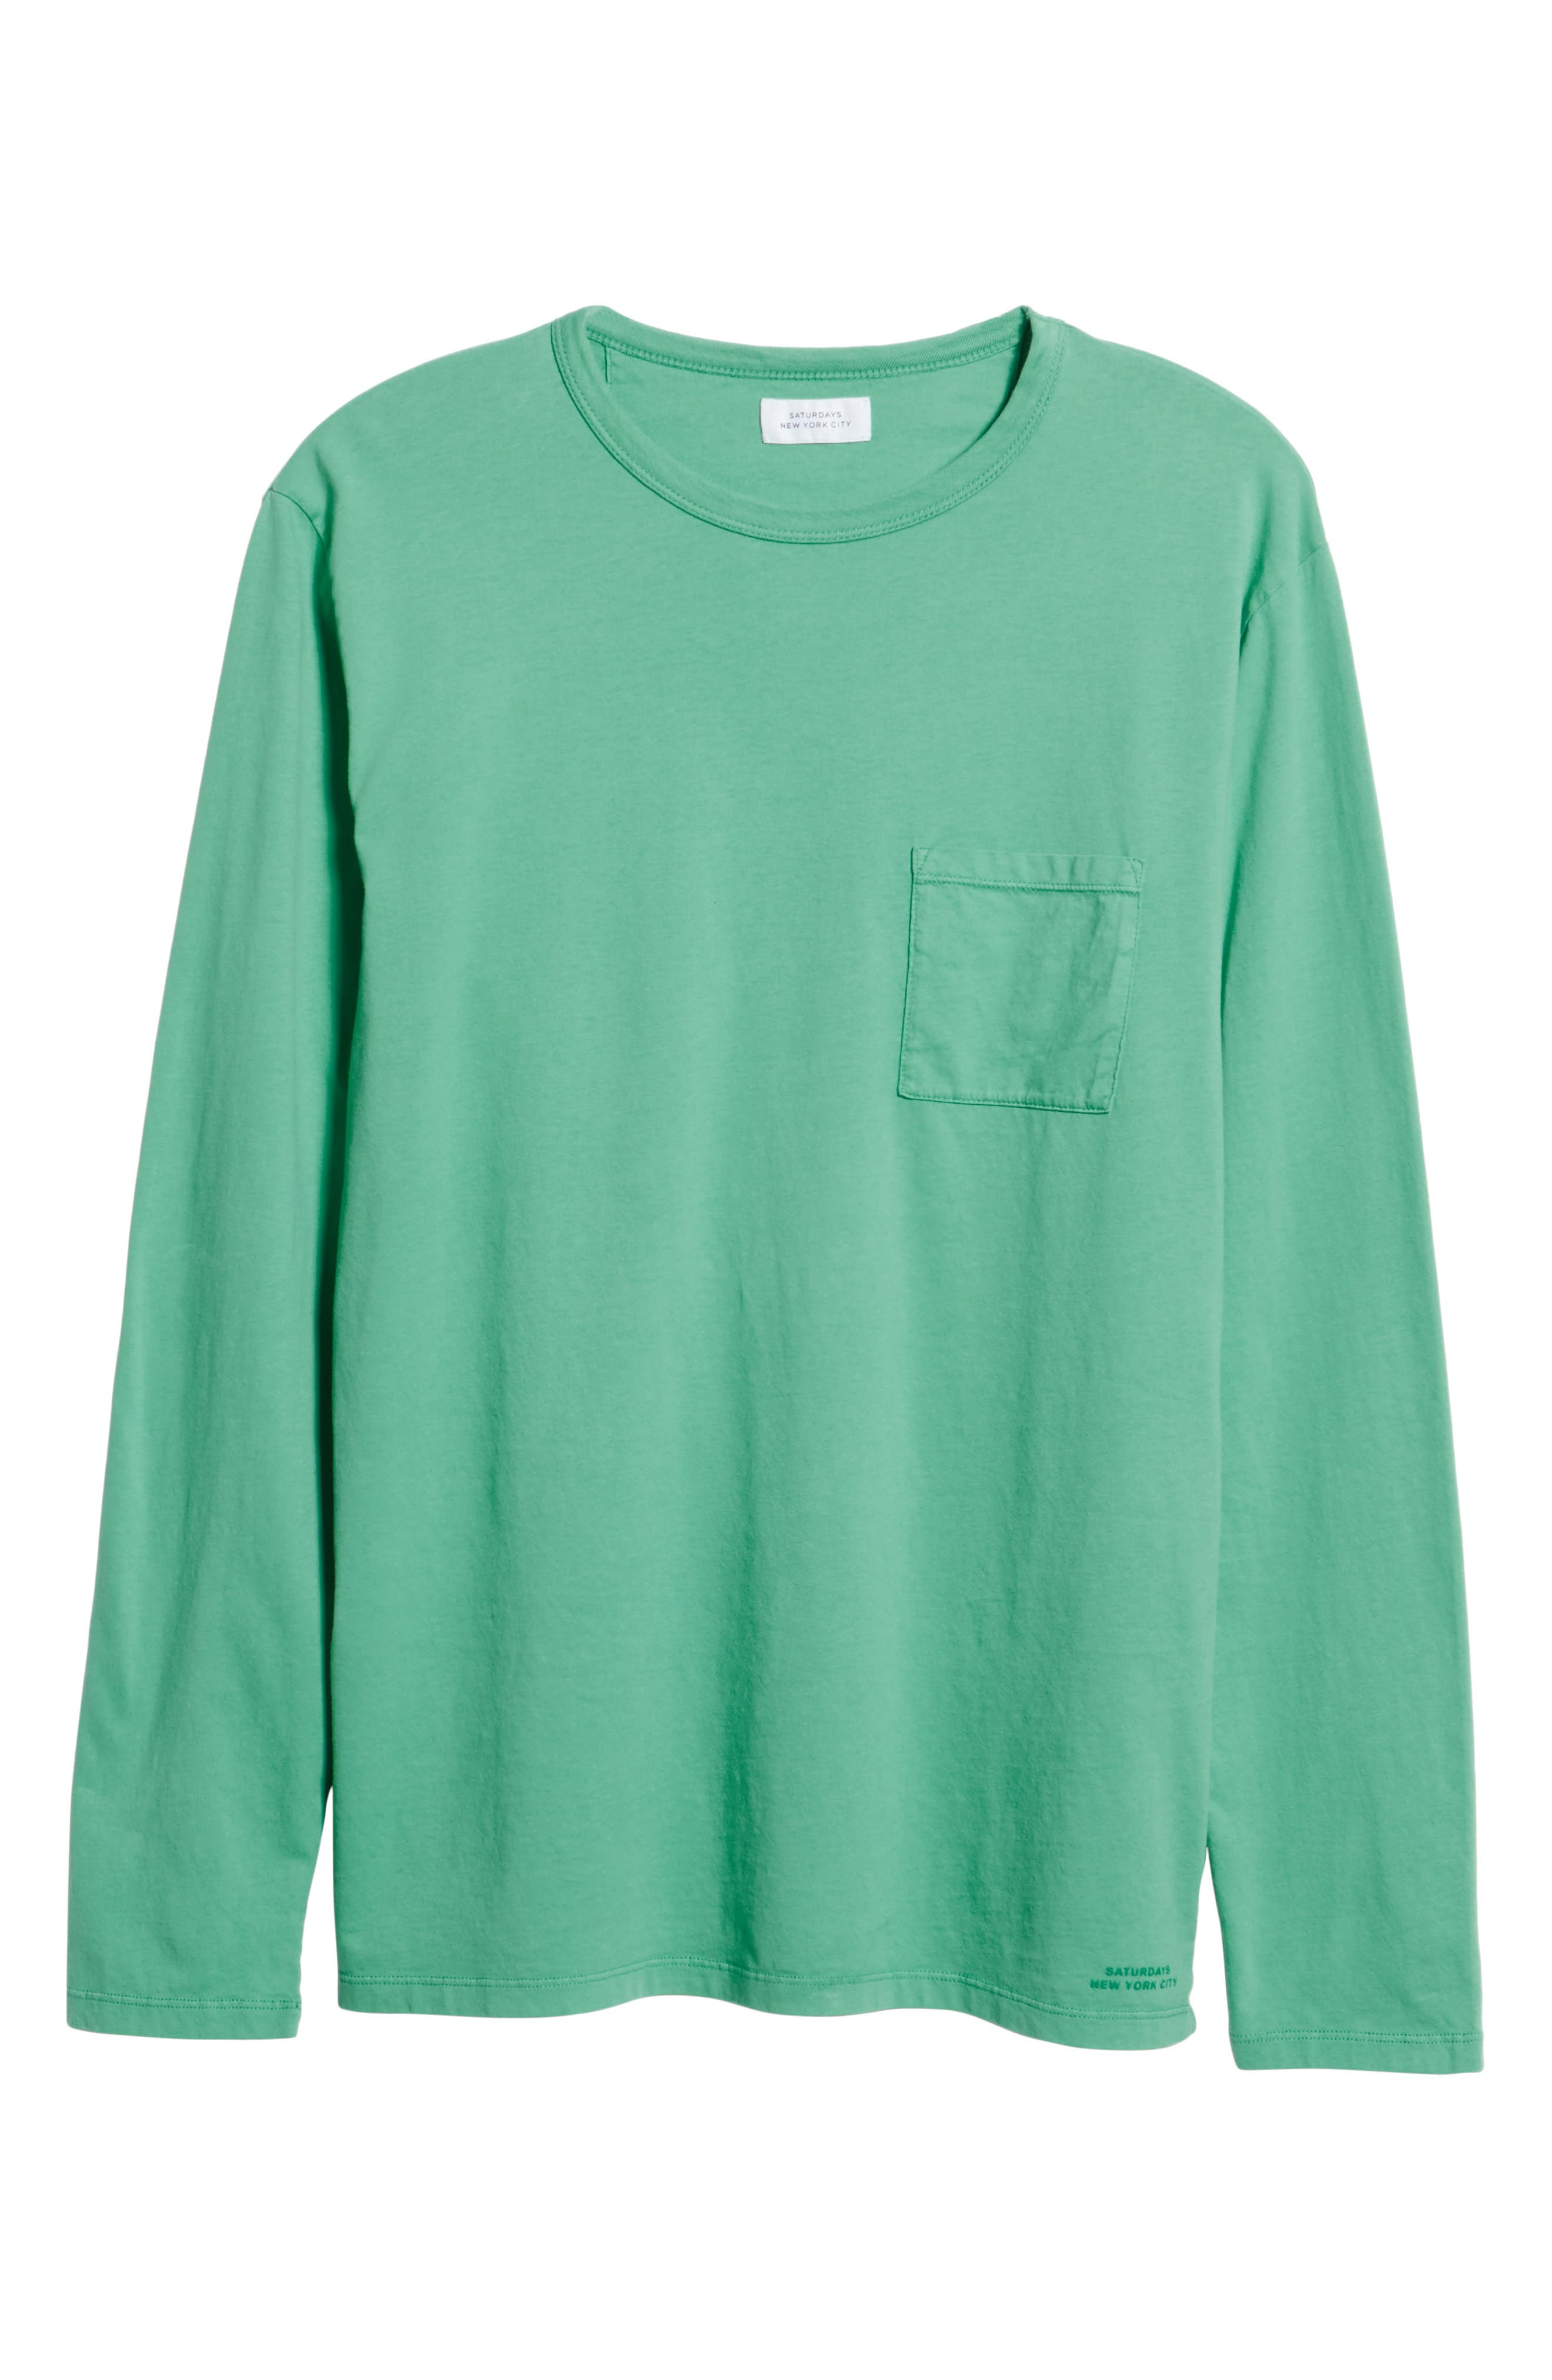 James Pima Long Sleeve Pocket T-Shirt,                             Alternate thumbnail 6, color,                             SEAFOAM GREEN